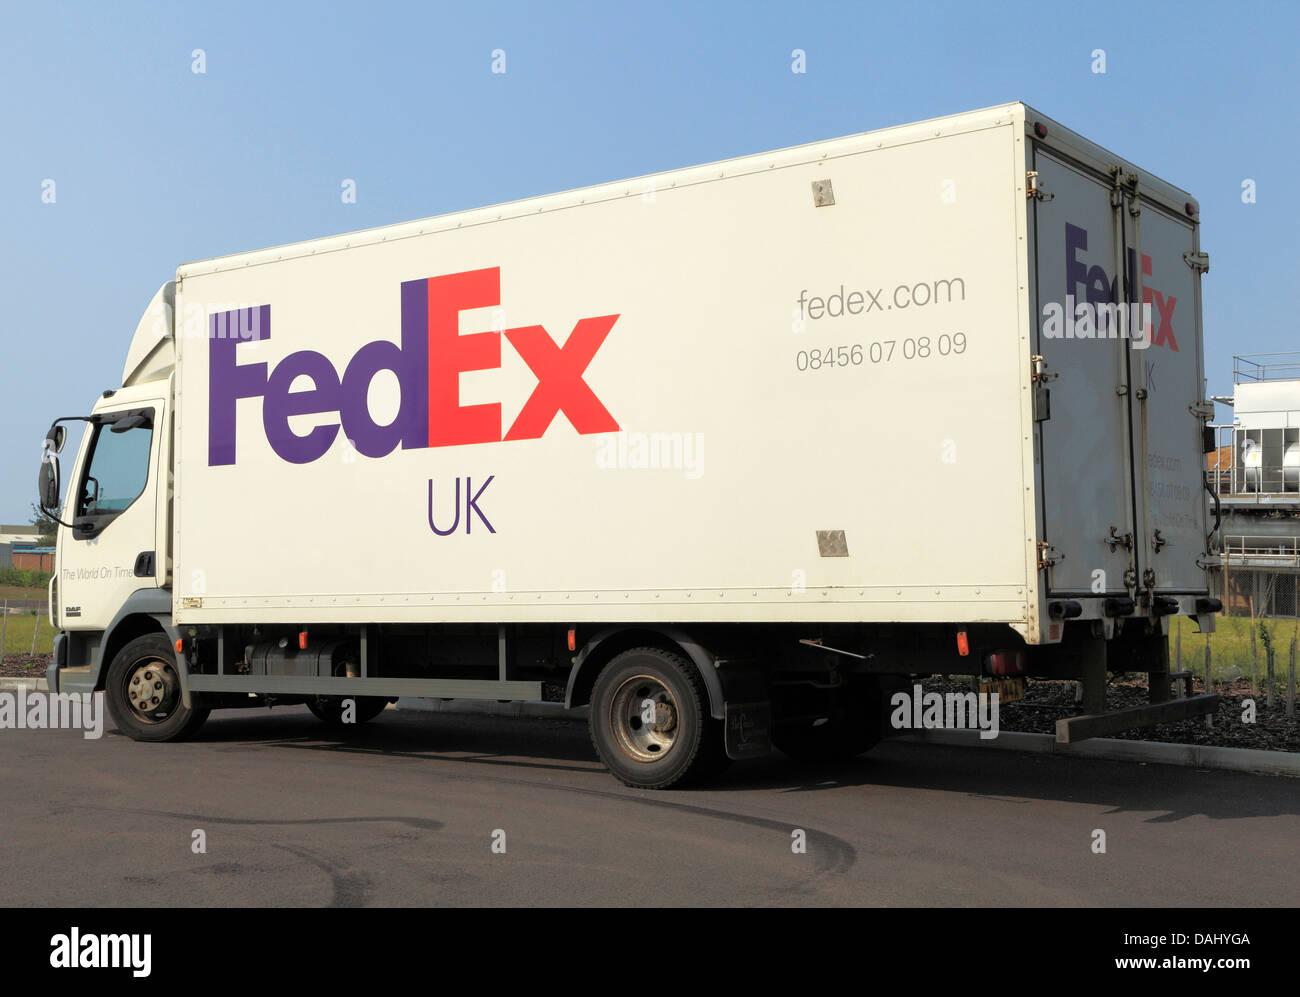 Fed Ex transporter truck transport véhicule camion FedEx UK Angleterre logo sign Photo Stock